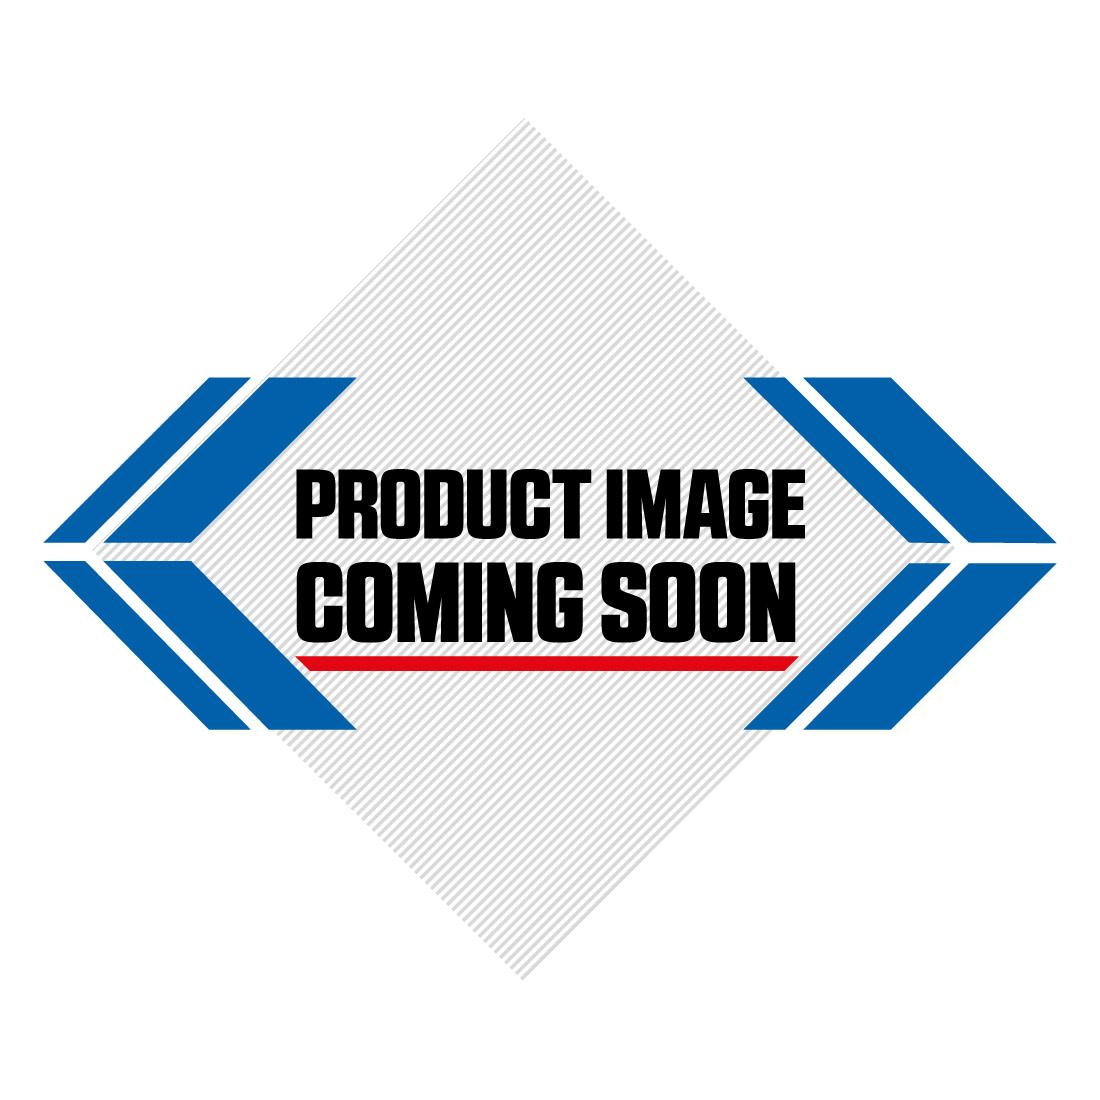 Suzuki Plastic Kit RMZ 450 (08-17) OEM Factory Image-5